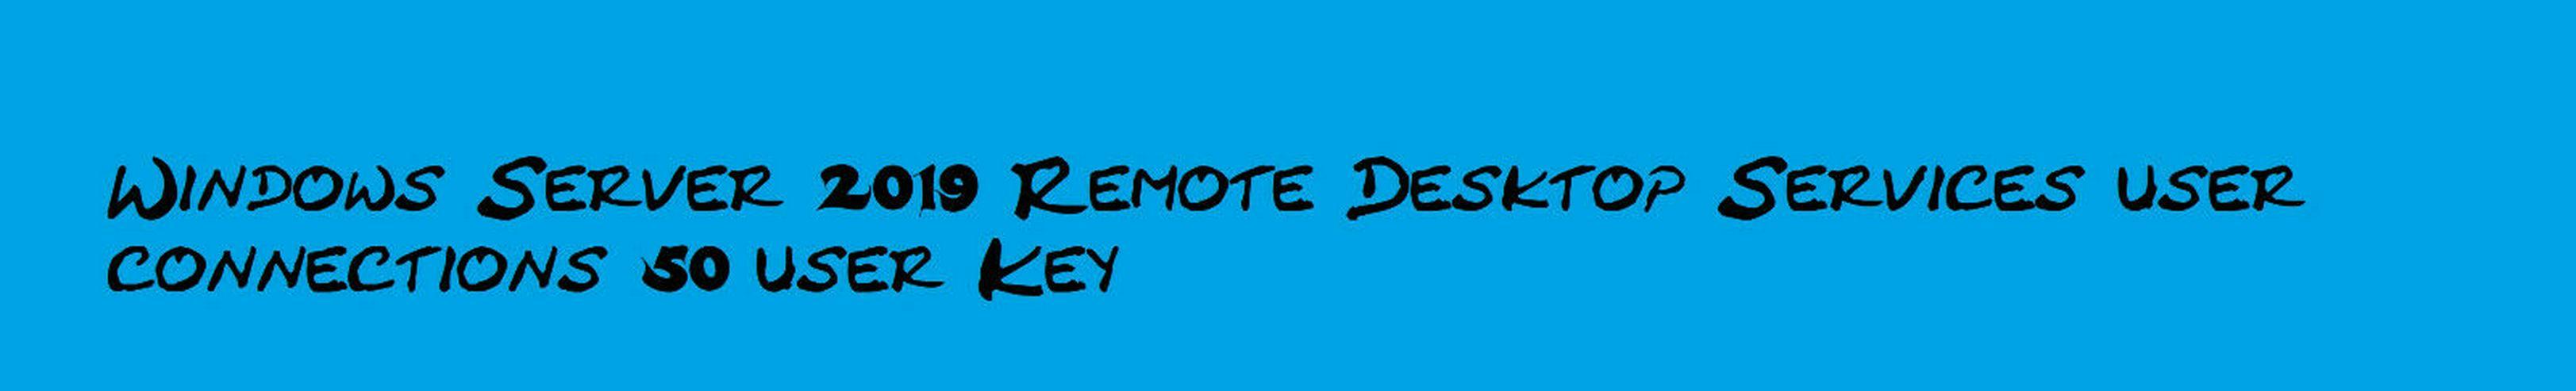 Windows Server 2019 Remote Desktop Services user connections 50 User Key